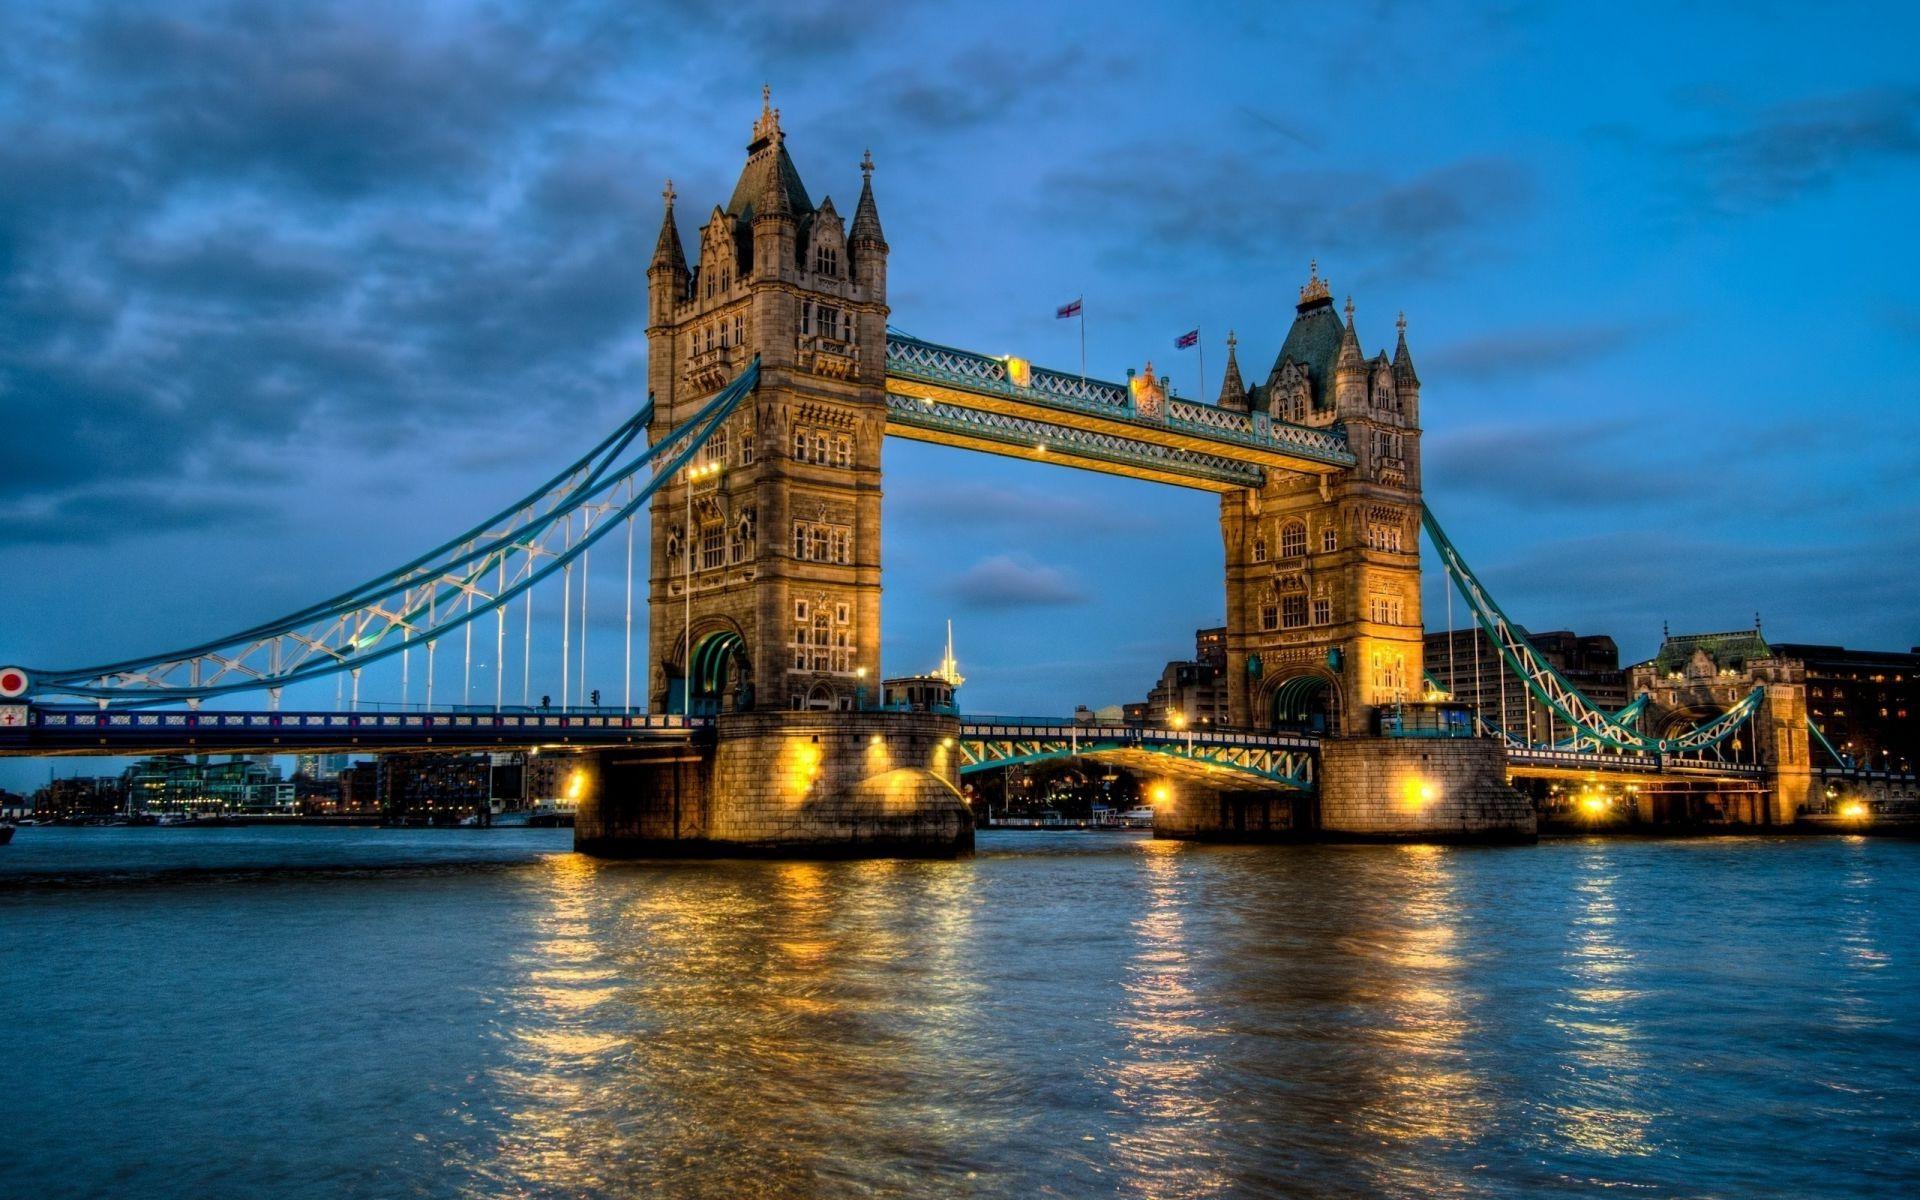 tower bridge london london england uk england thames. android